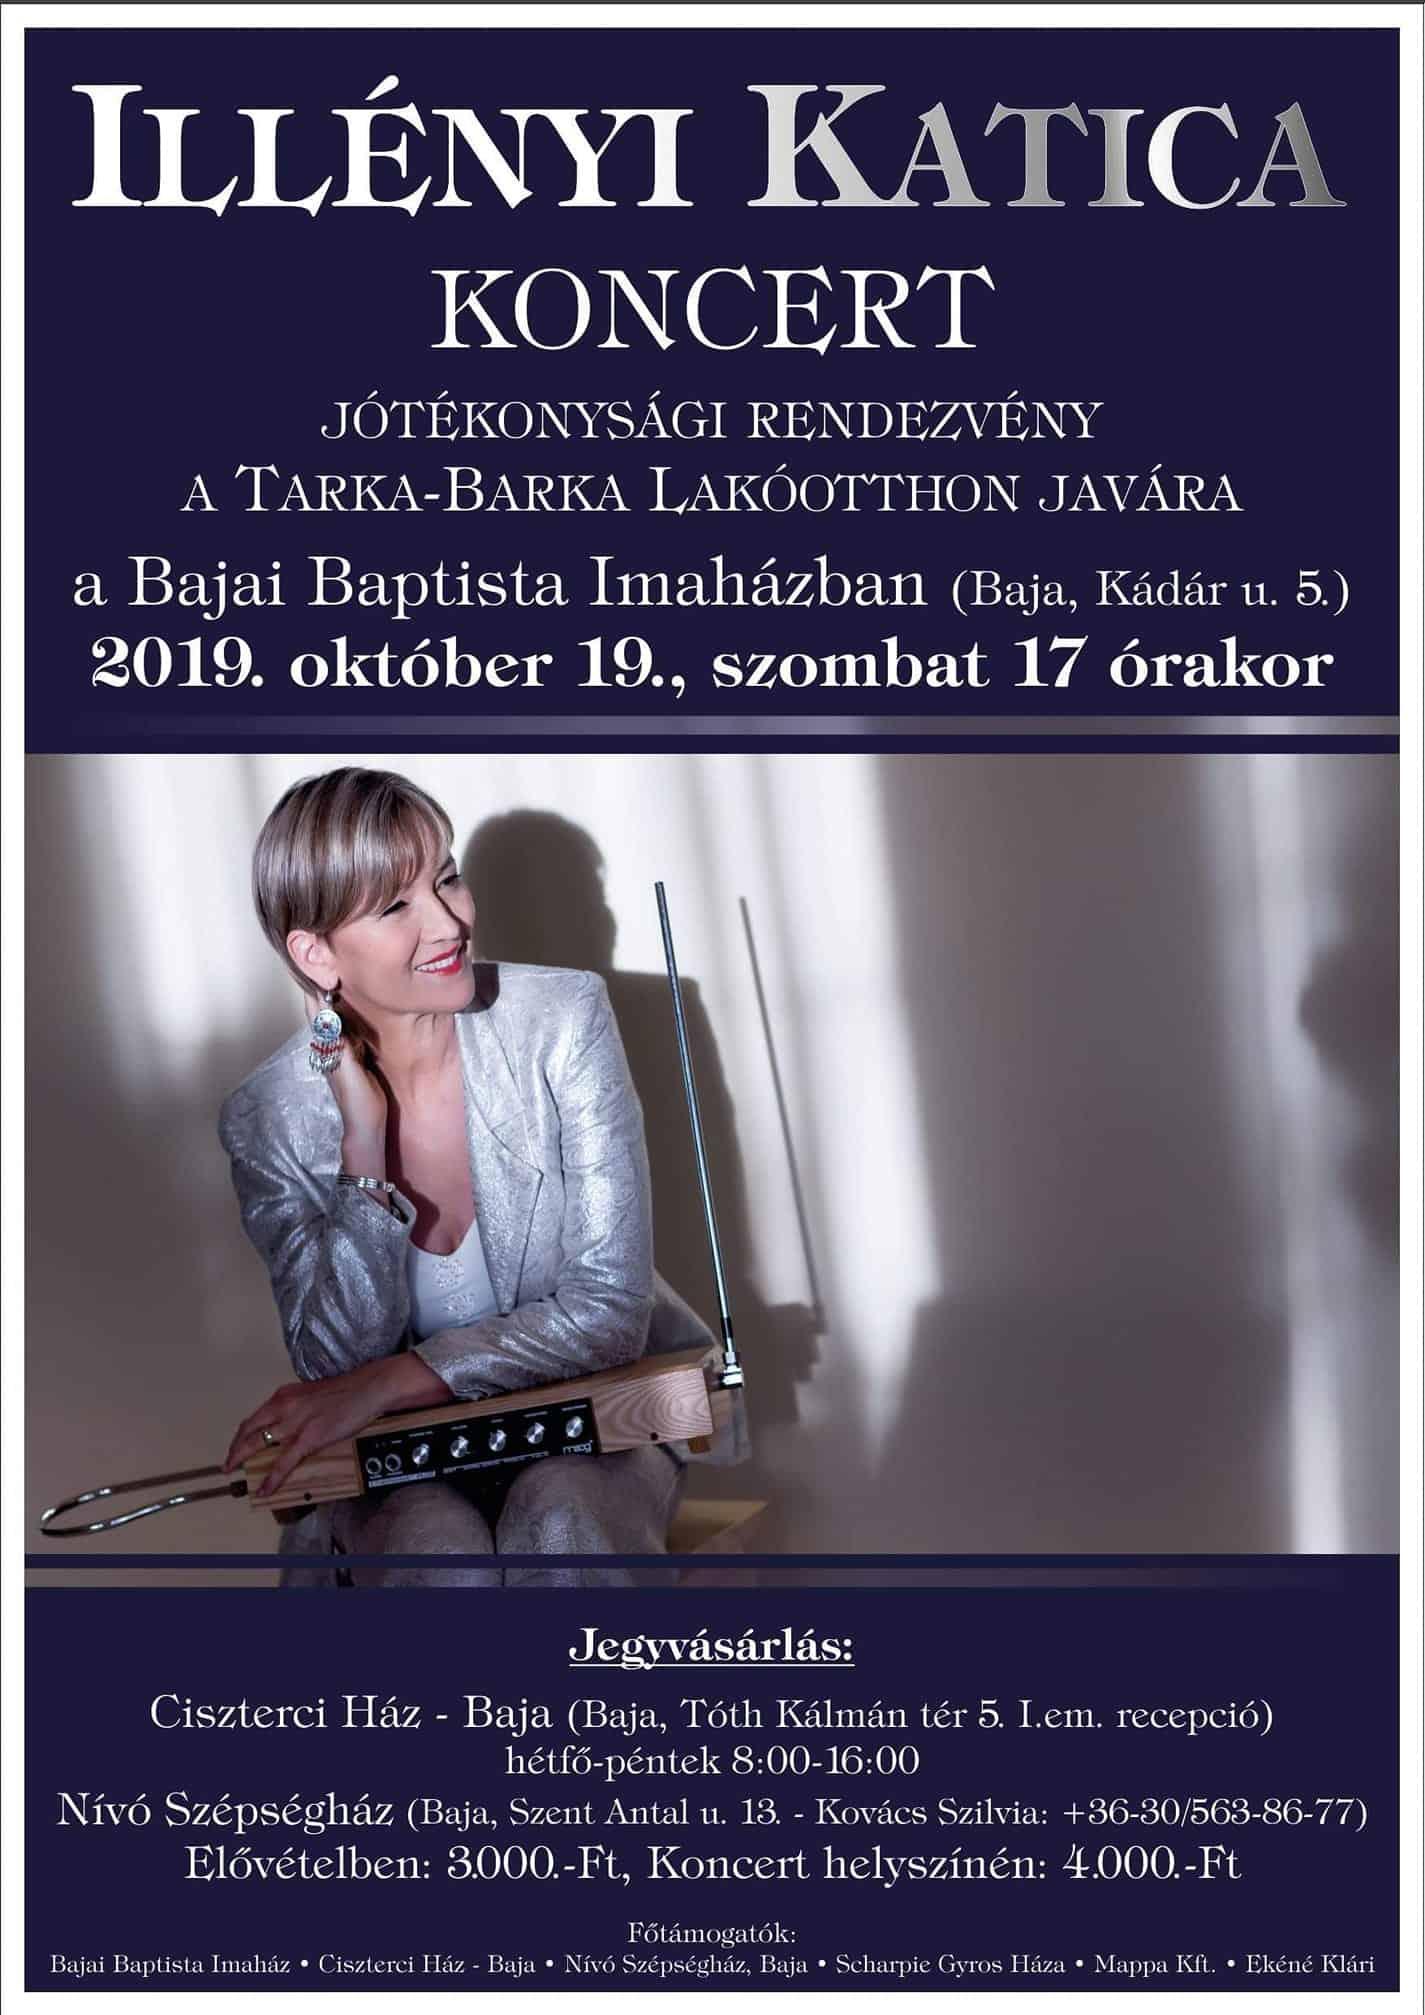 Illényi Katica koncert